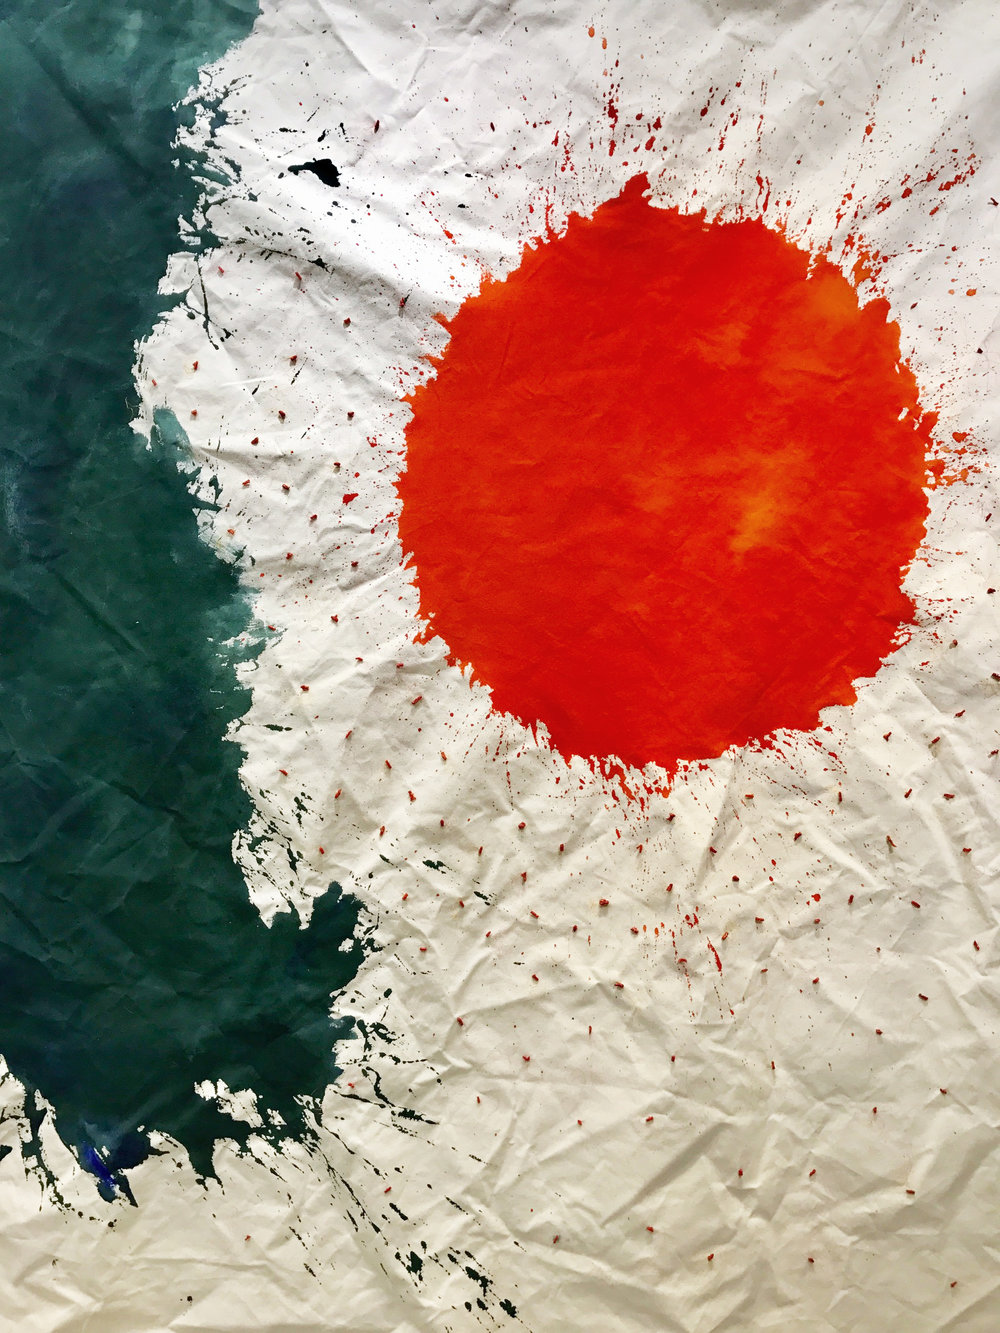 〈大紅珊瑚|A Big Red Coral〉,2018,